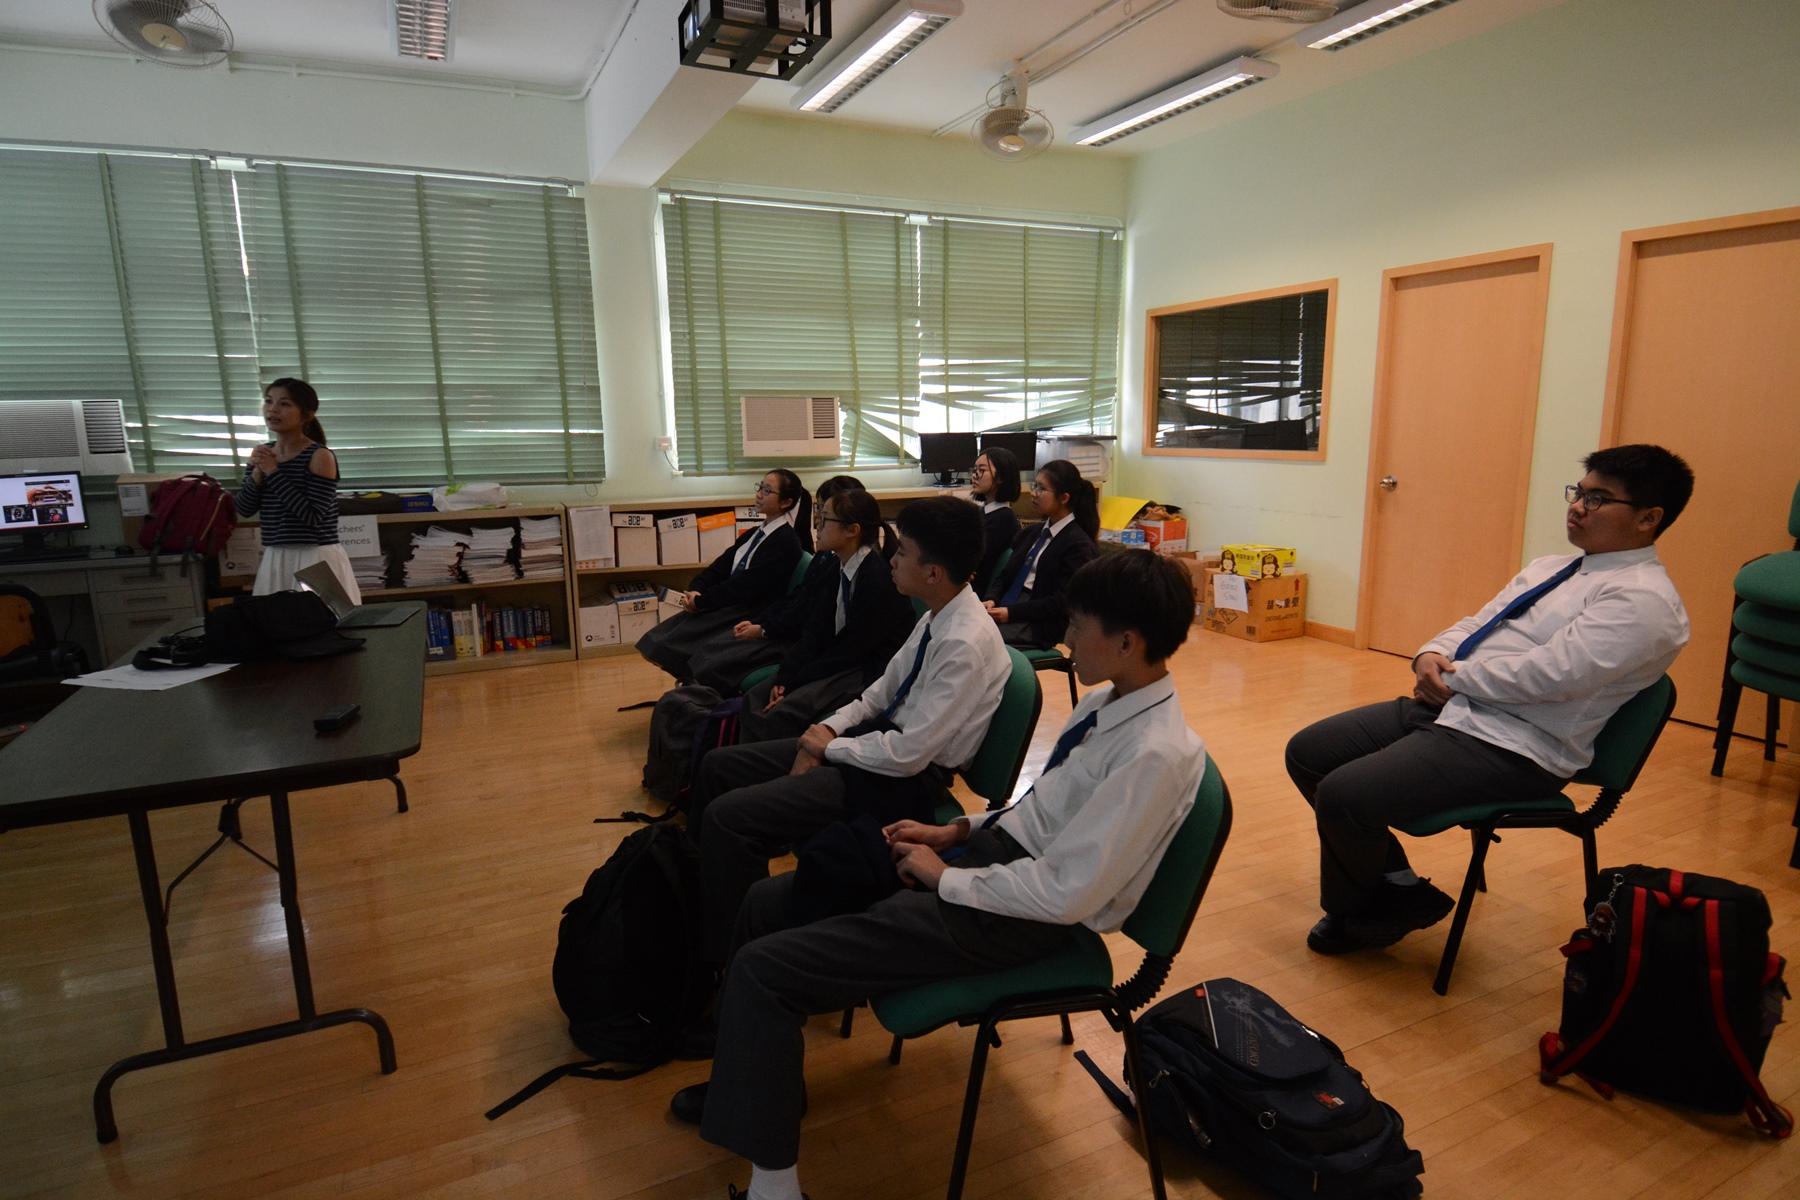 http://npc.edu.hk/sites/default/files/dsc_1517.jpg